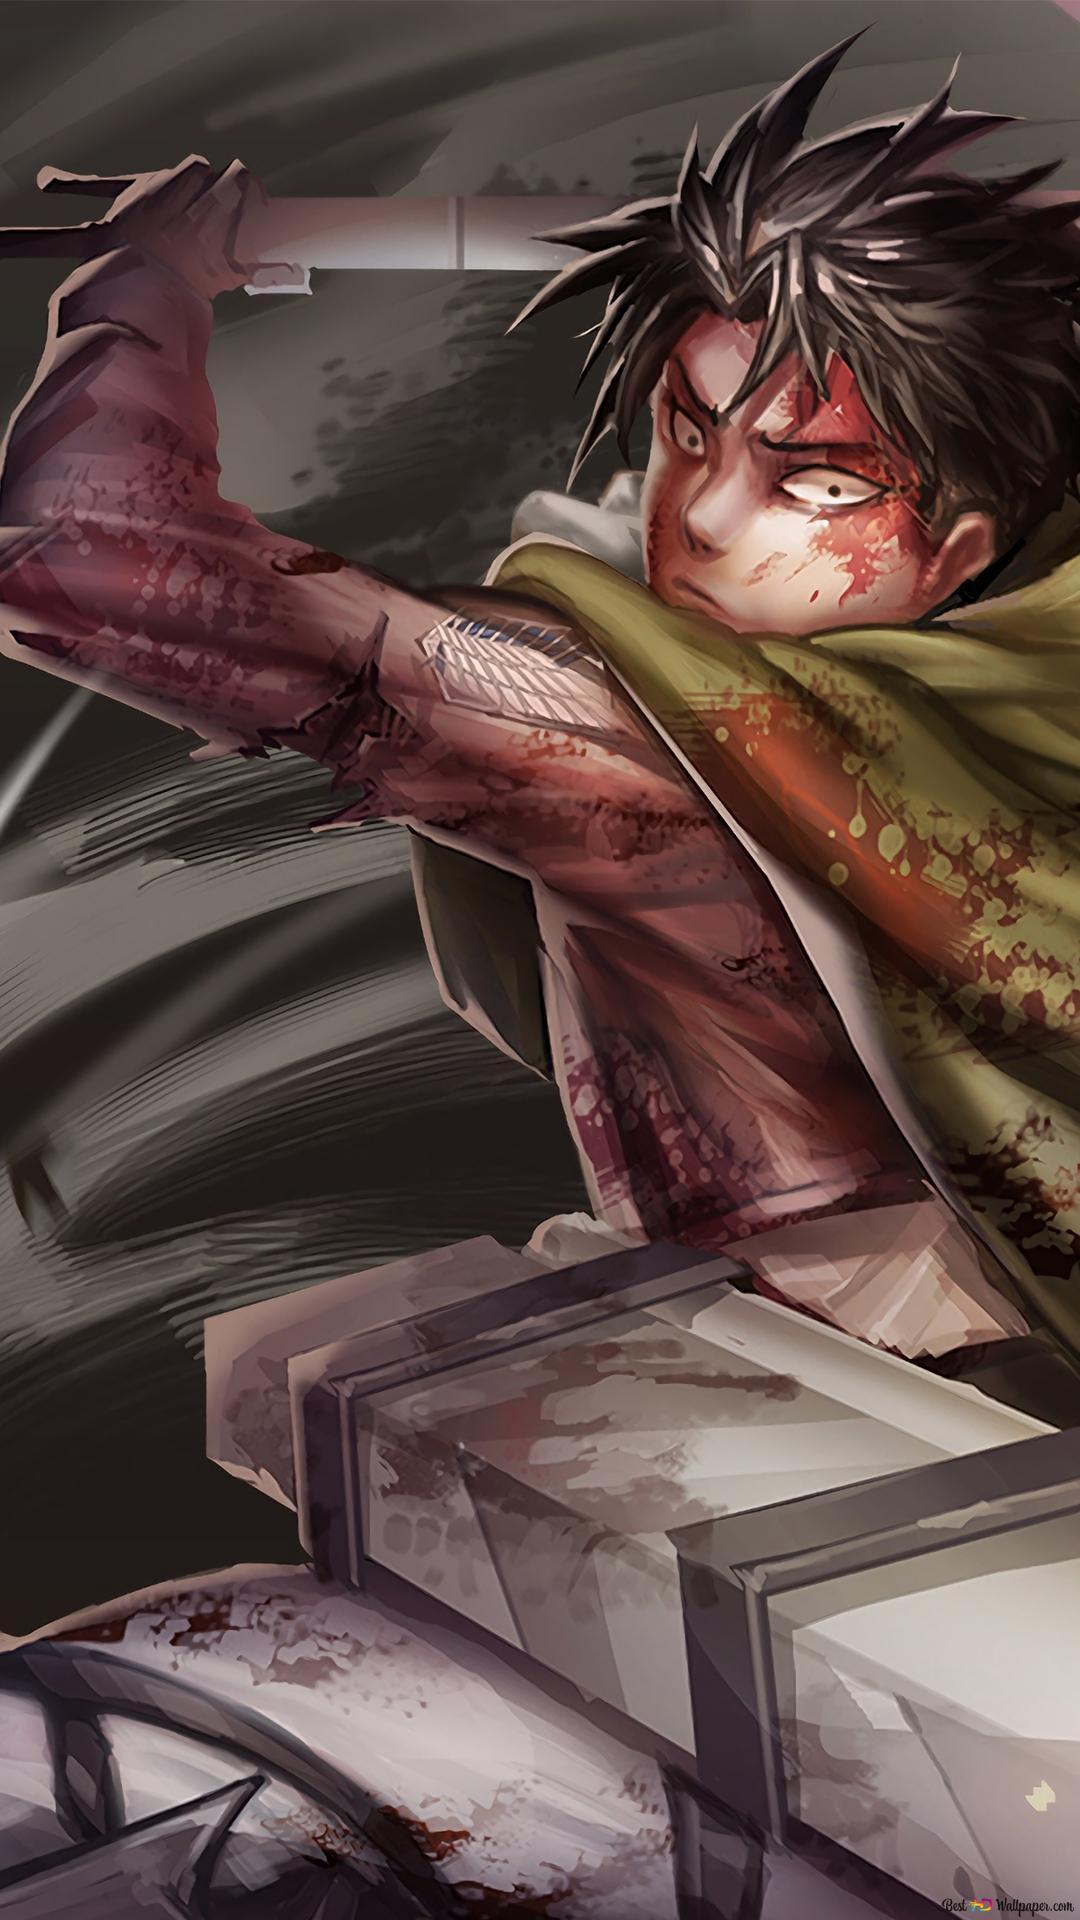 Attack On Titan Levi Ackerman Hd Wallpaper Download